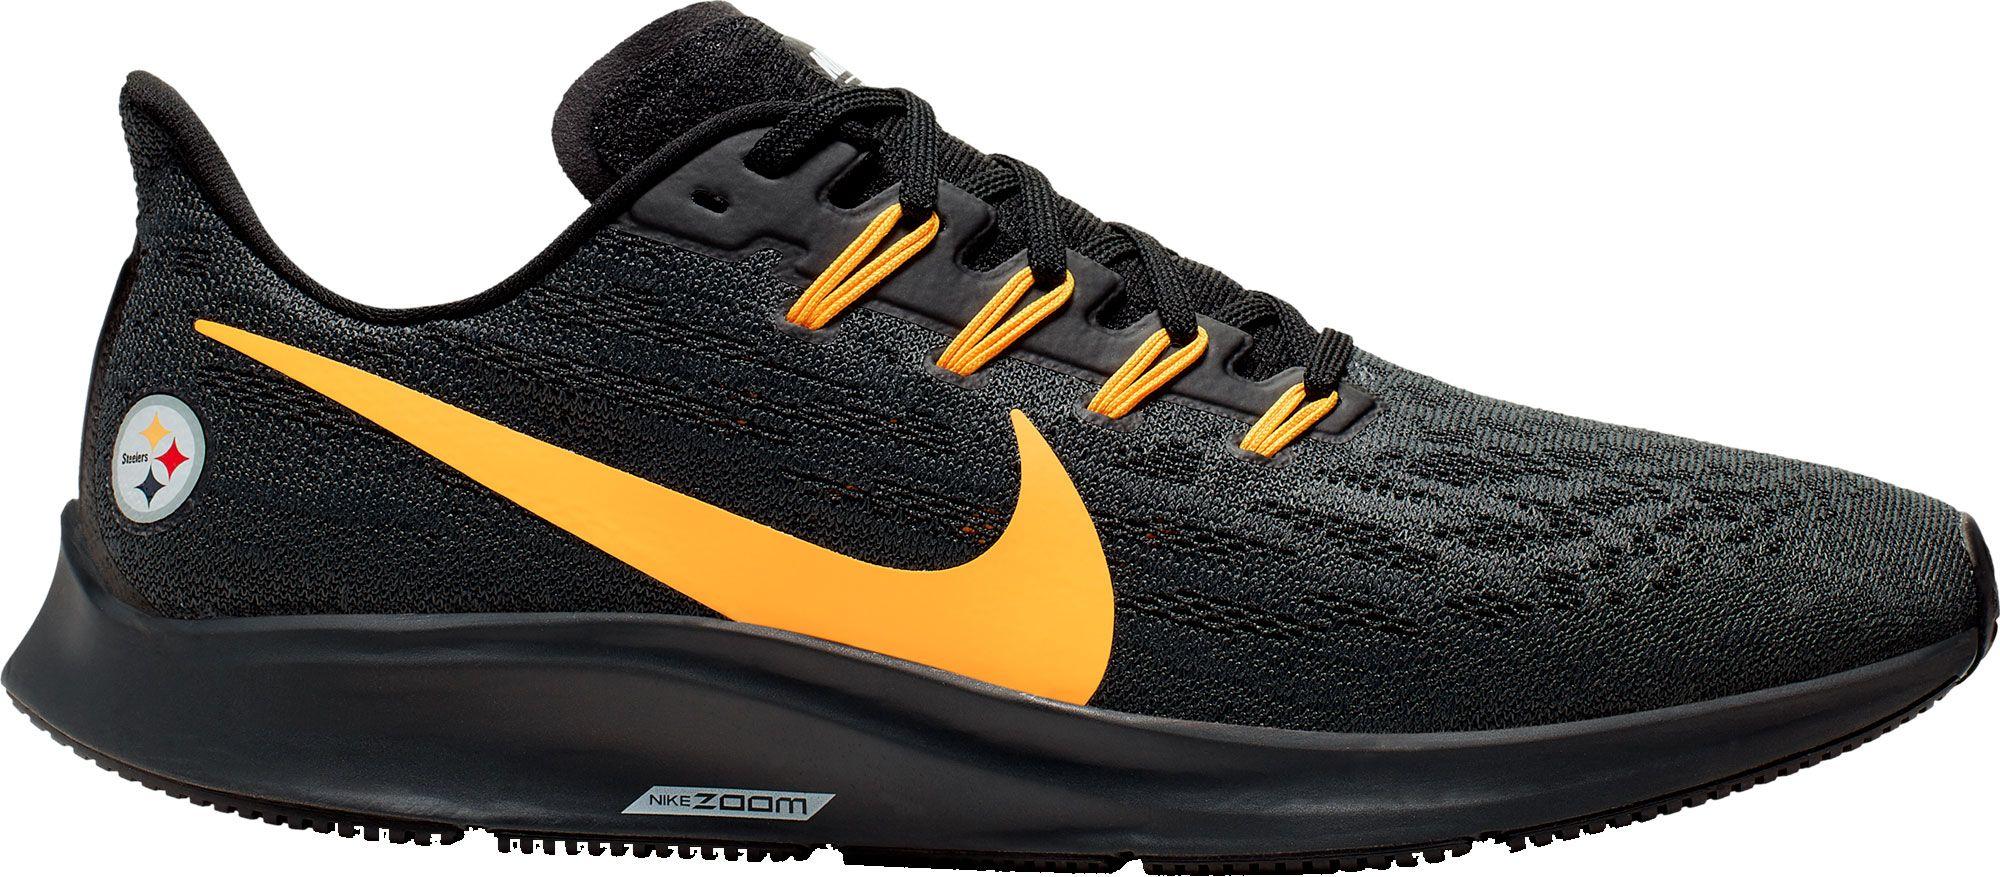 Air Zoom Pegasus 36 Running Shoes